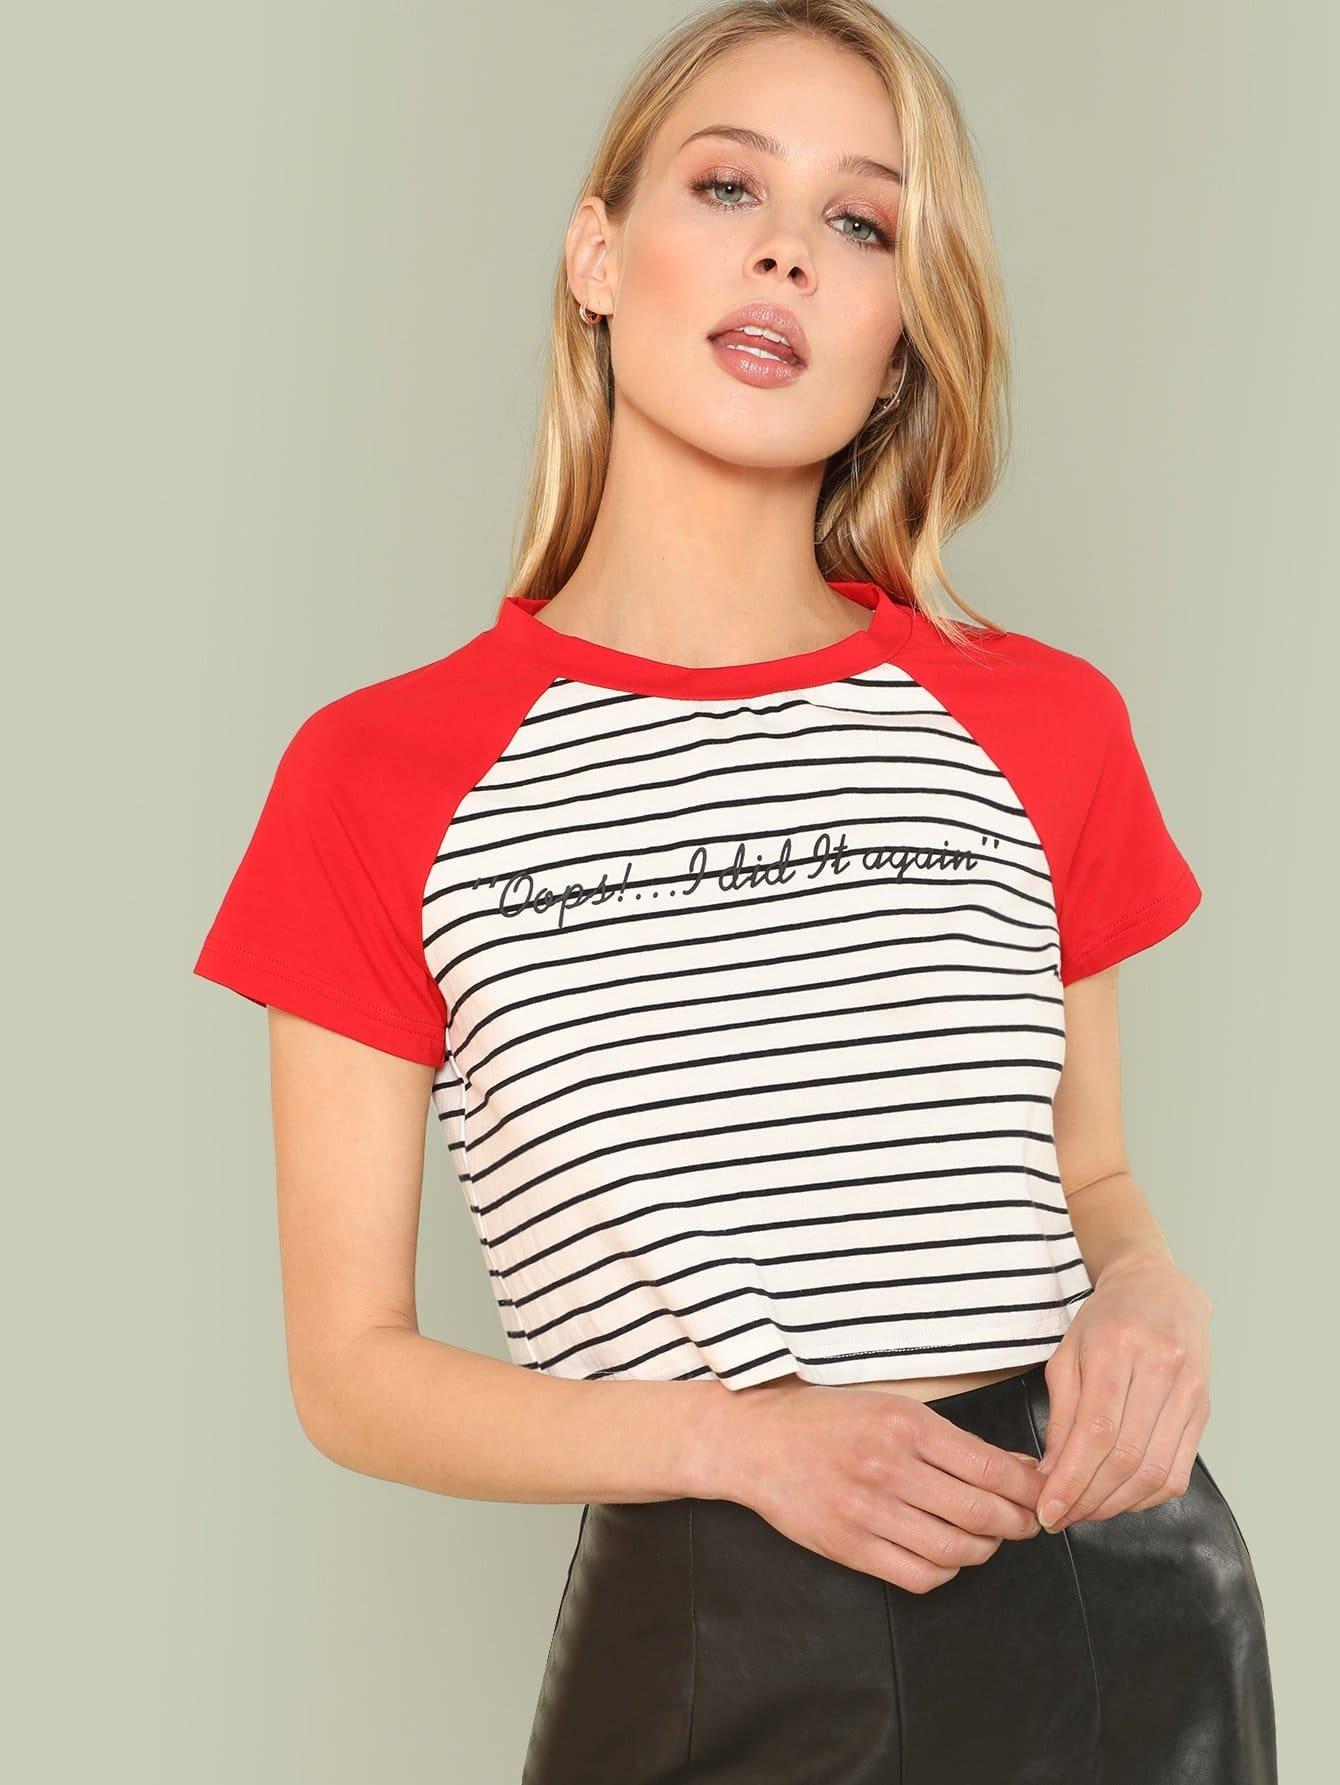 Contrast Raglan Sleeve Striped Tee contrast striped trim camo print tee